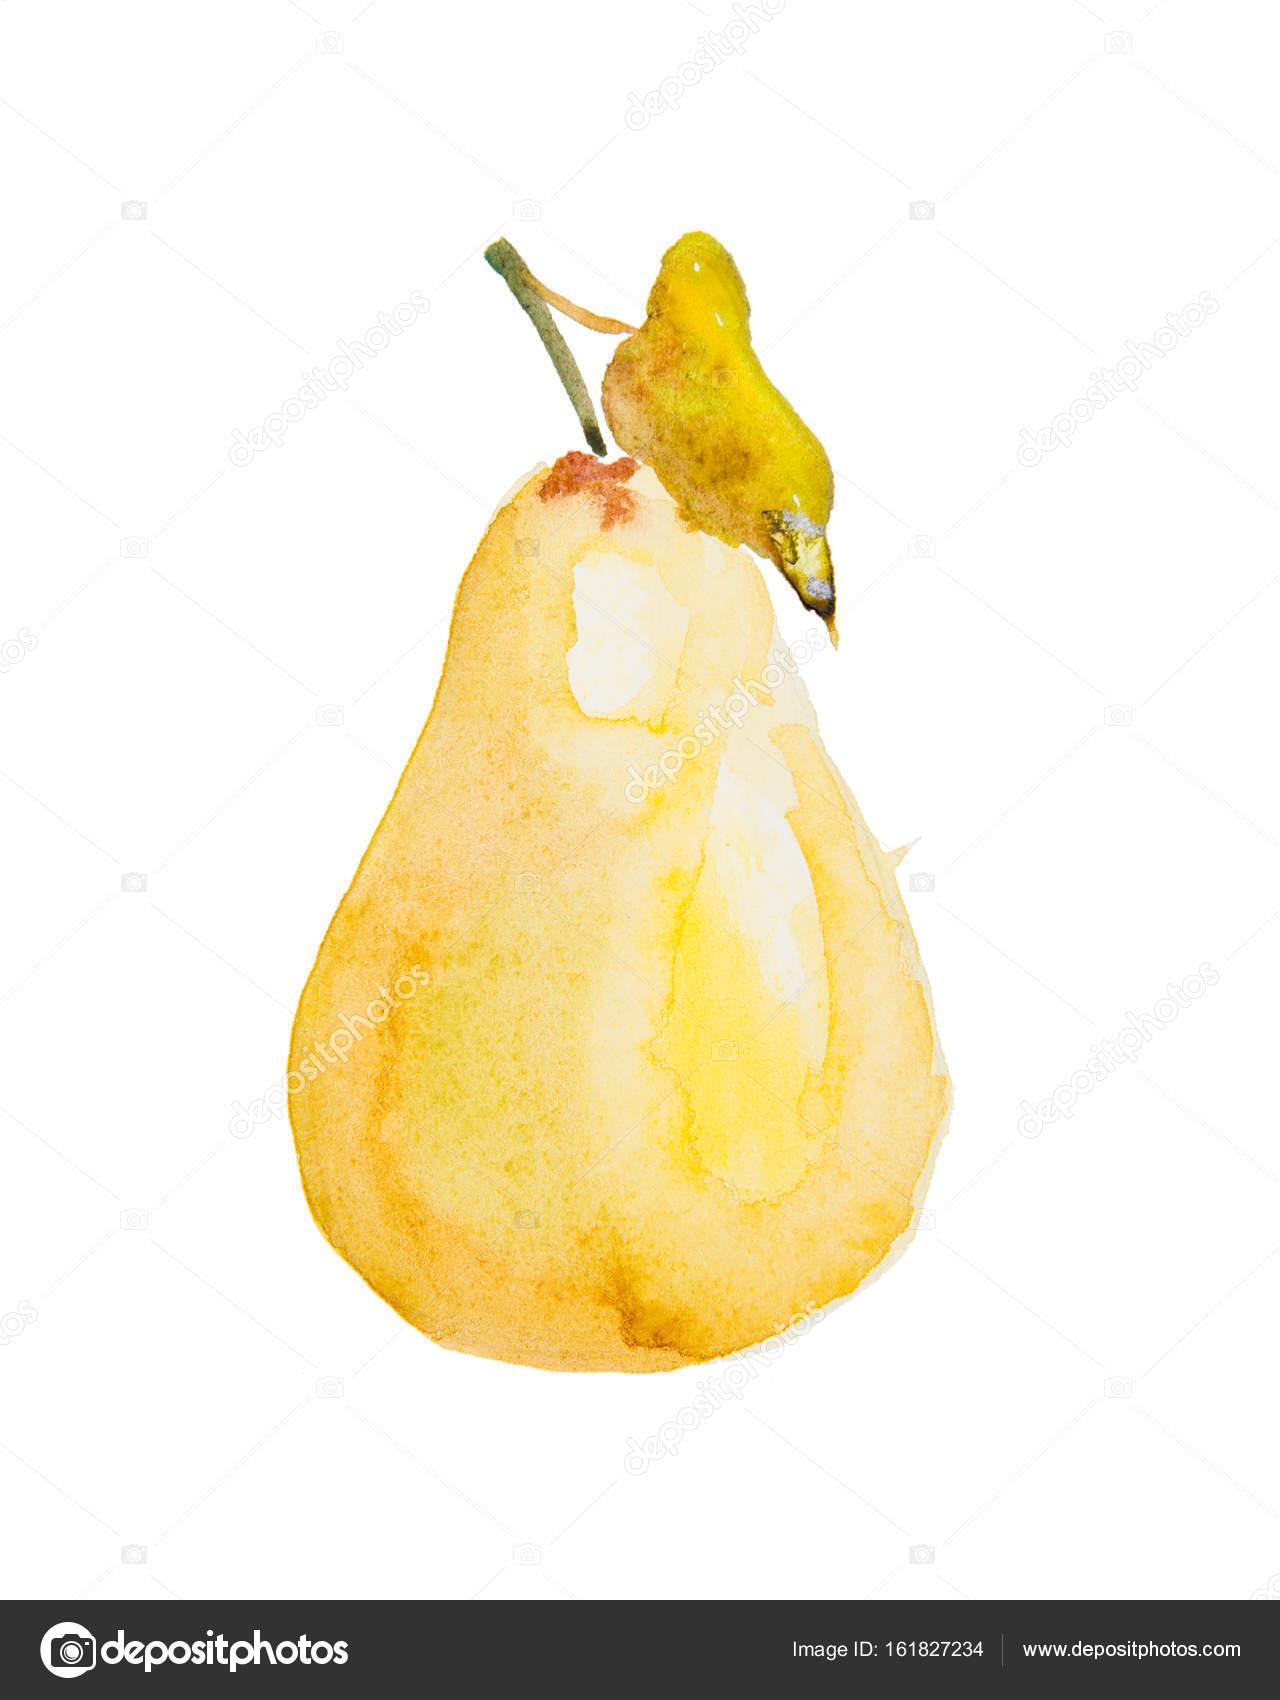 Watercolor Illustration Of A Pear Stock Photo C Lenanichizhenova